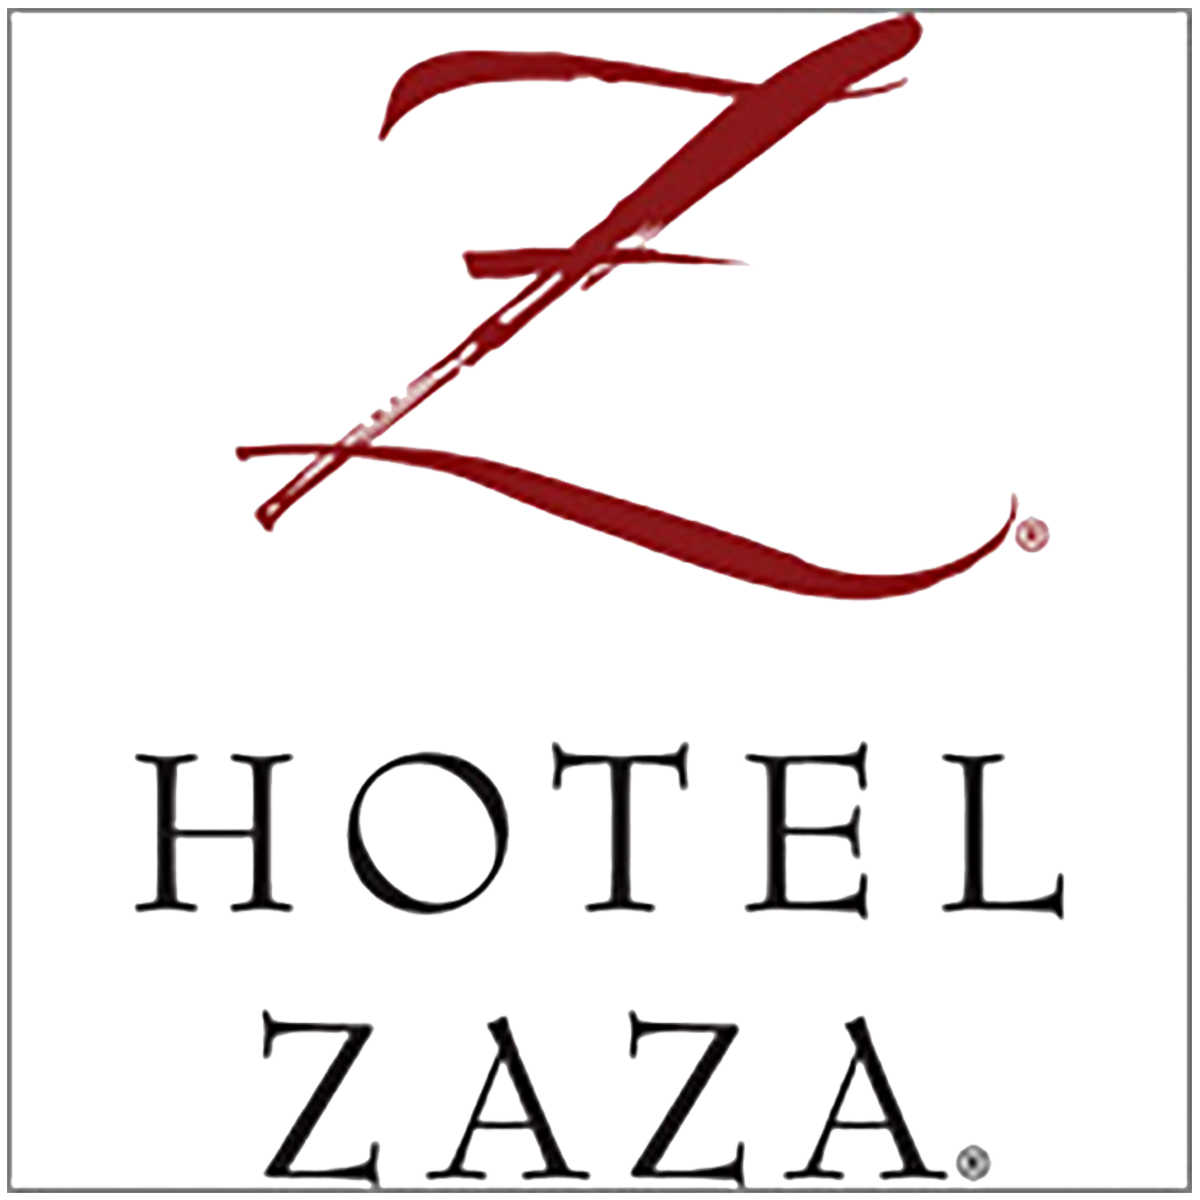 SQ-hotel-zaza.png